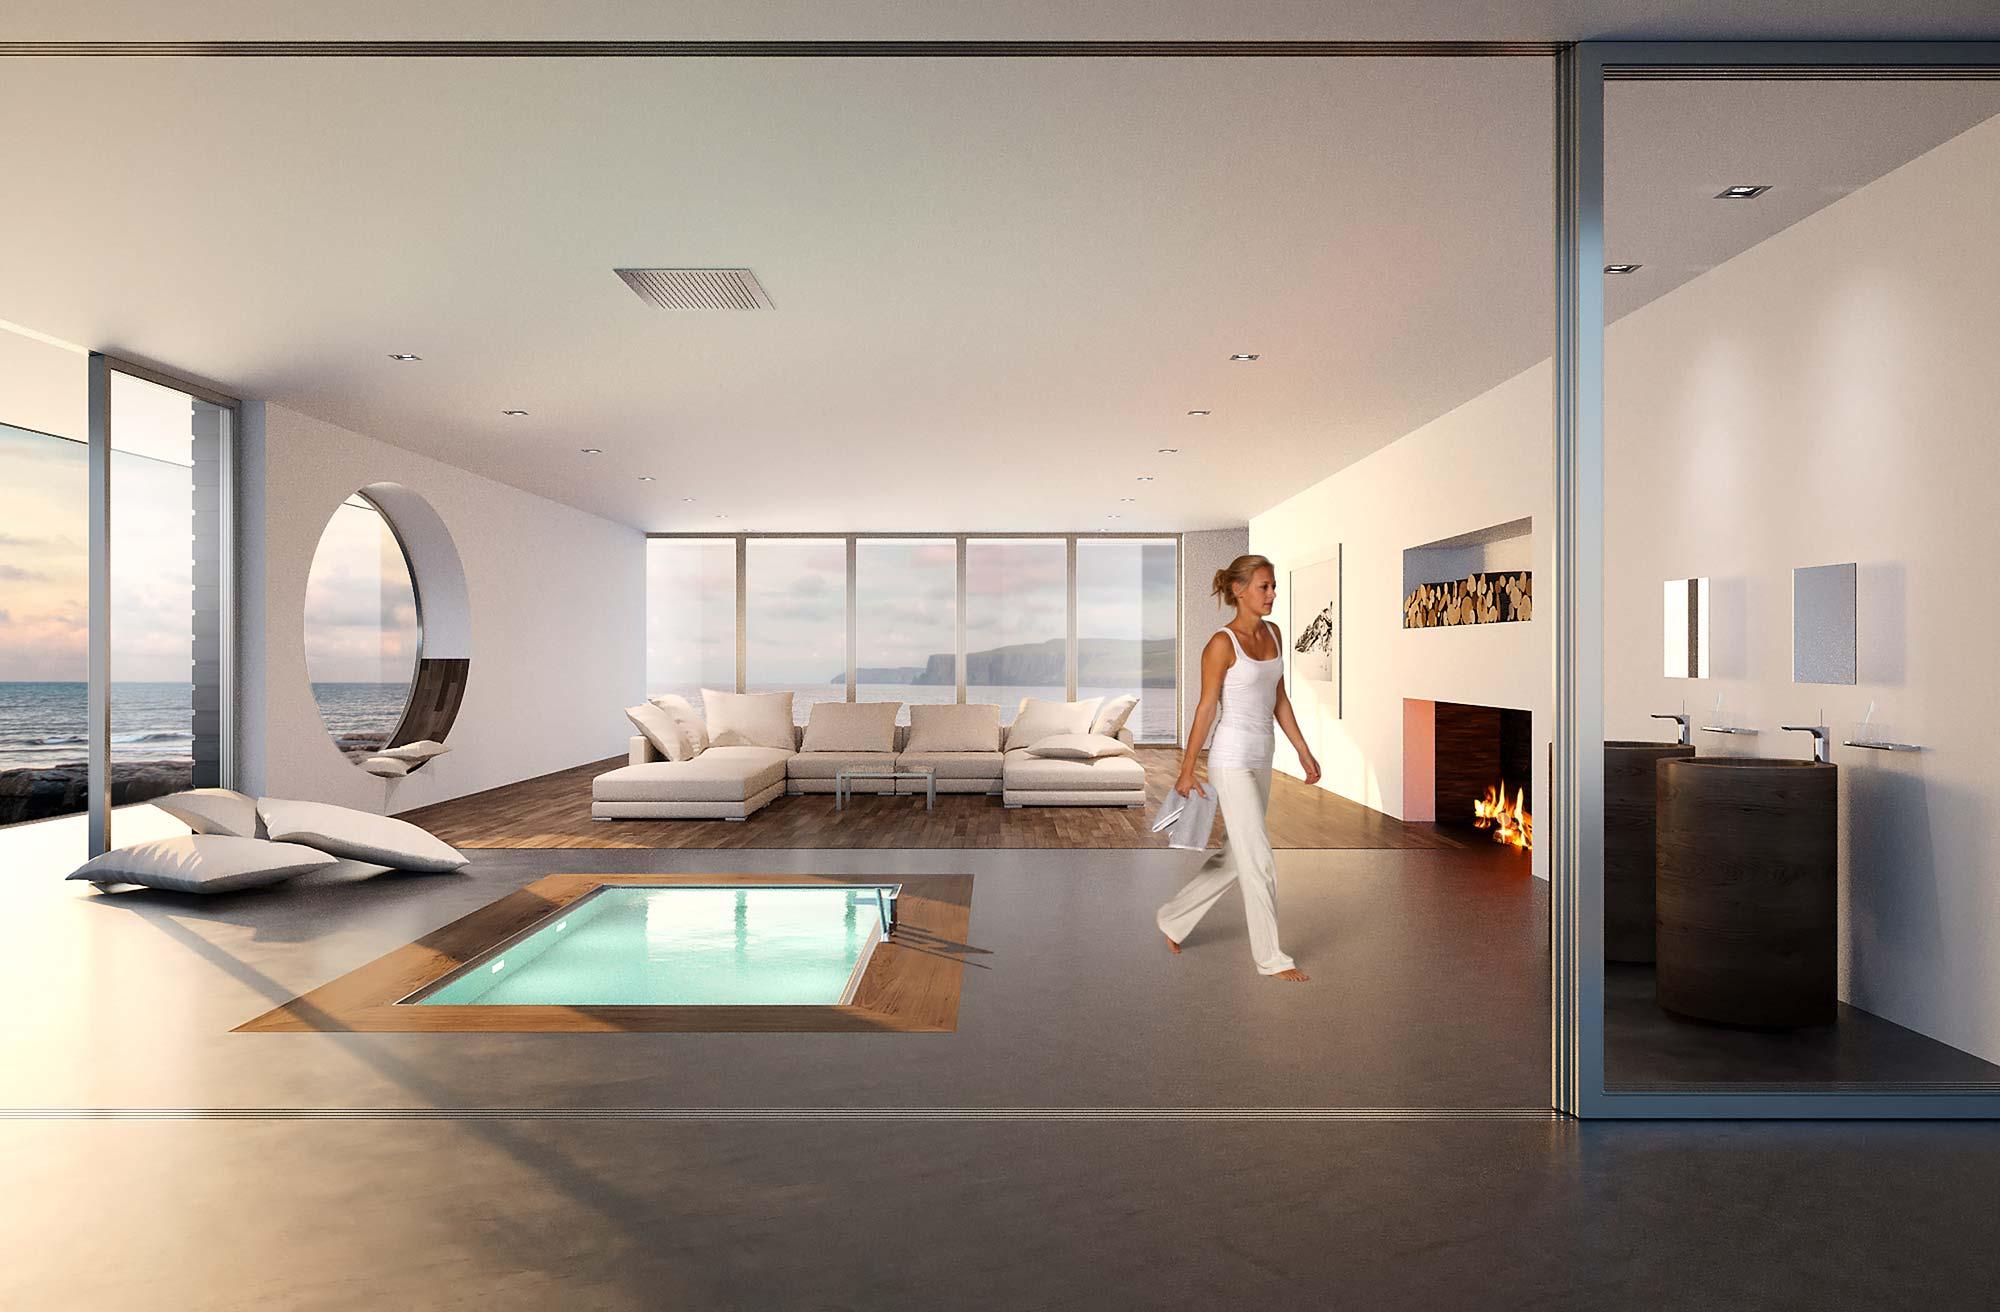 architektur wohnen archive schmiddem design. Black Bedroom Furniture Sets. Home Design Ideas